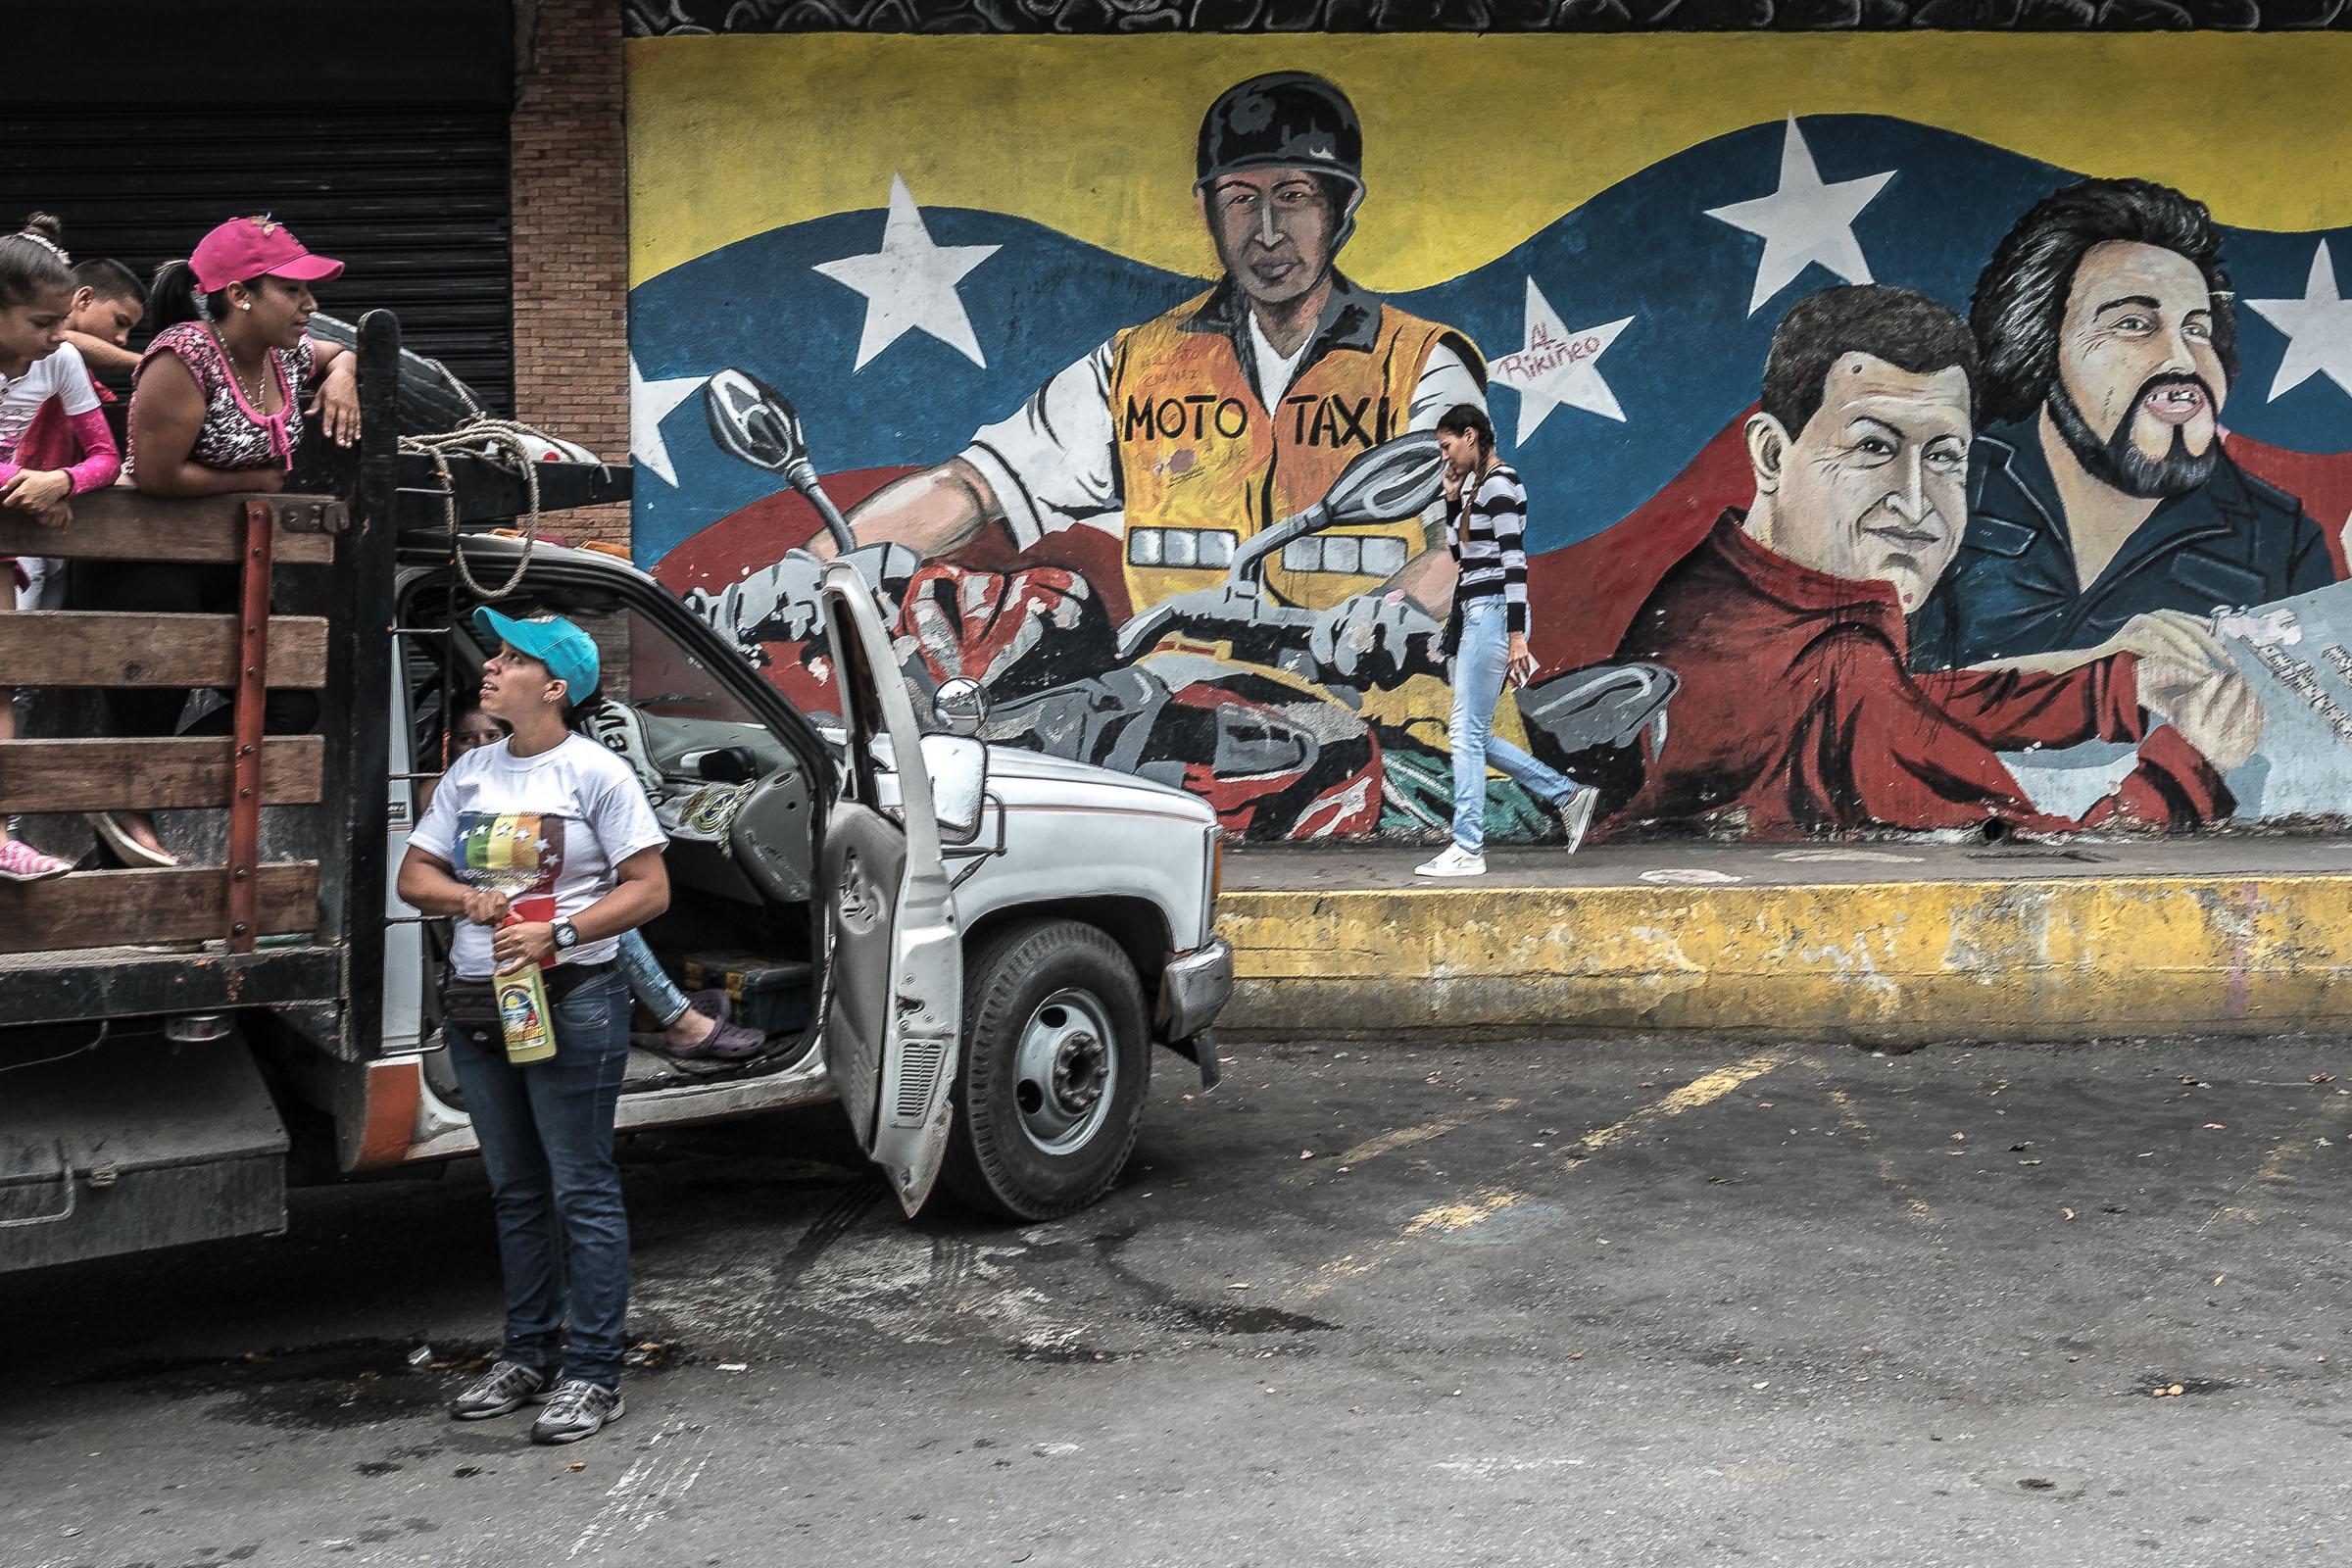 April 16, 2017 Maracay, Venezuela (Photo by Joris van Gennip/GroundTruth)